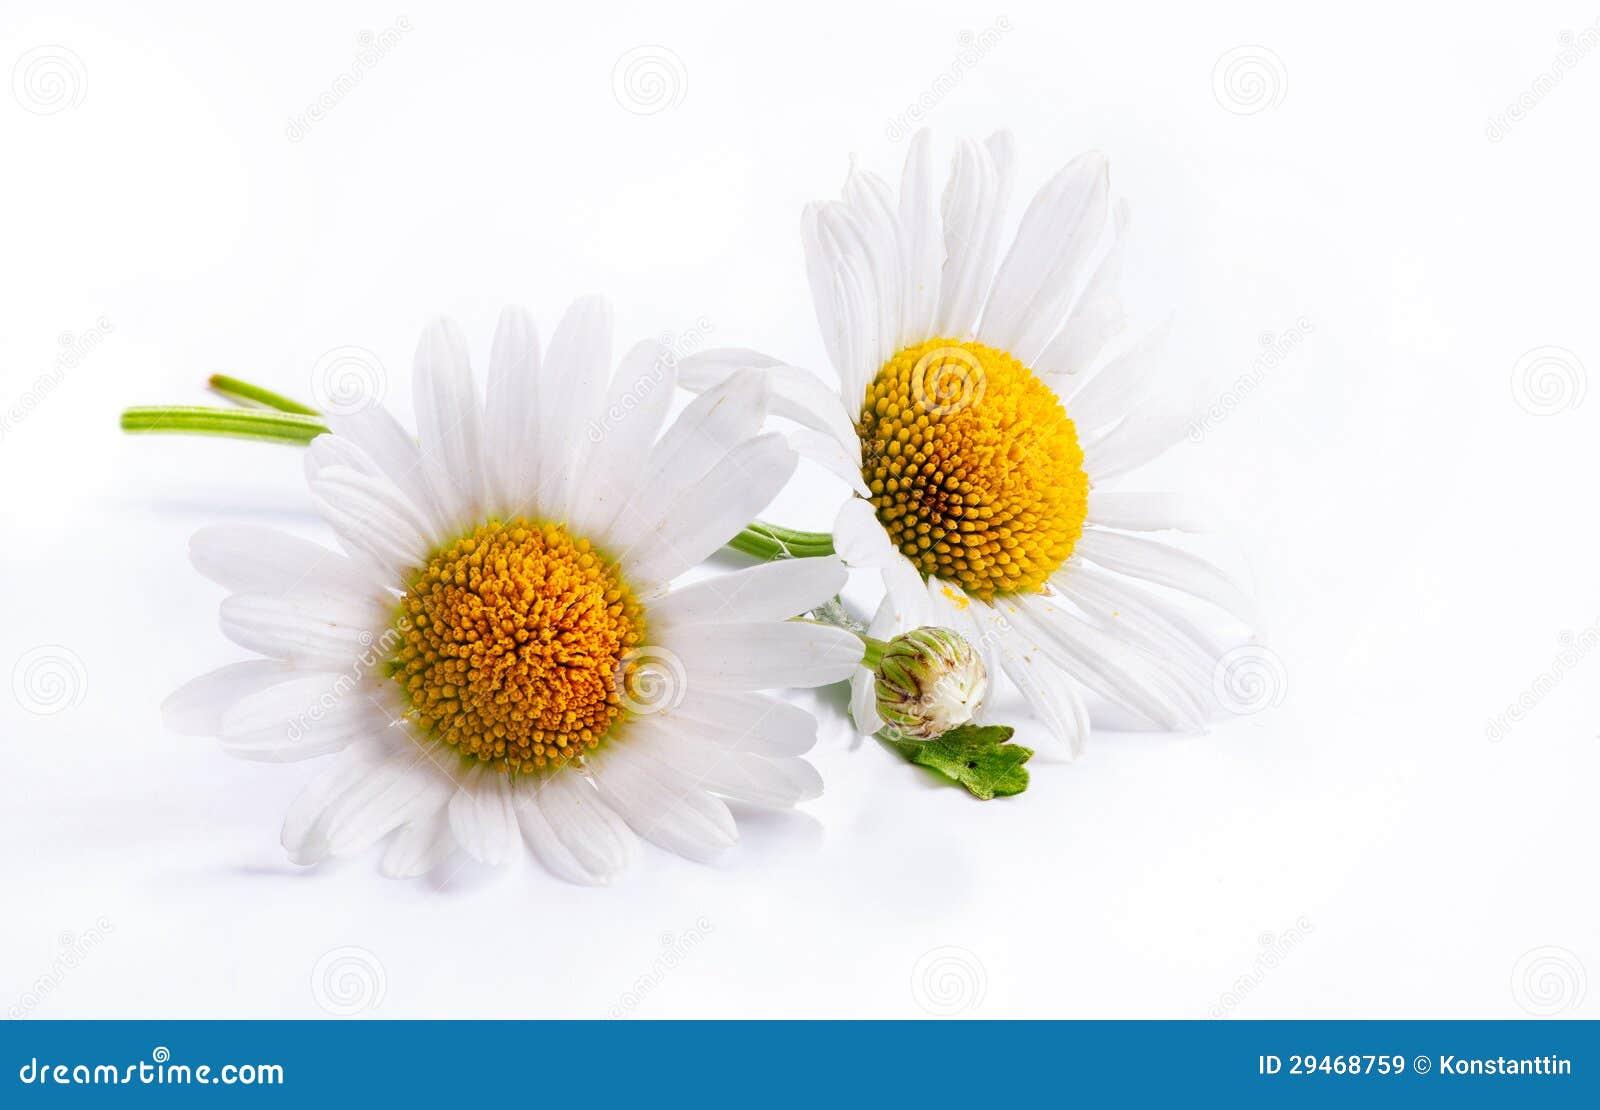 Art Daisies Spring White Flower Isolated On White Background Stock